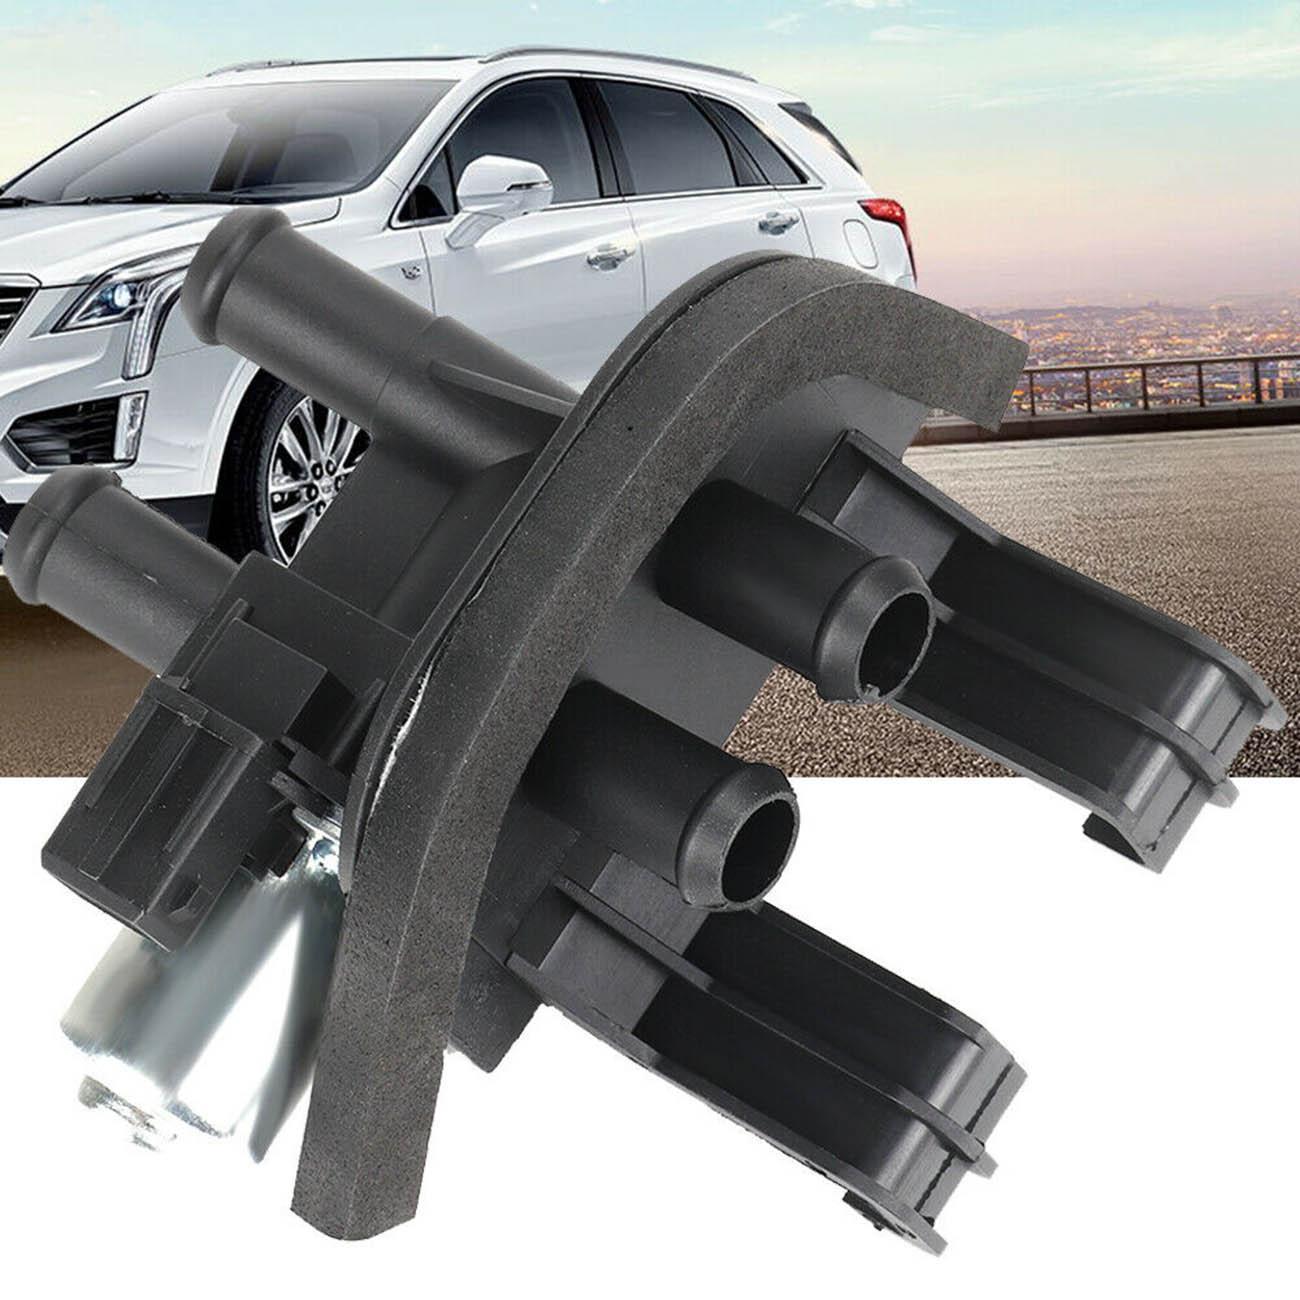 Ford Fiesta KA PUMA STREET TRANSIT TOURNEO CONNECT HEATER CONTROL VALVE New